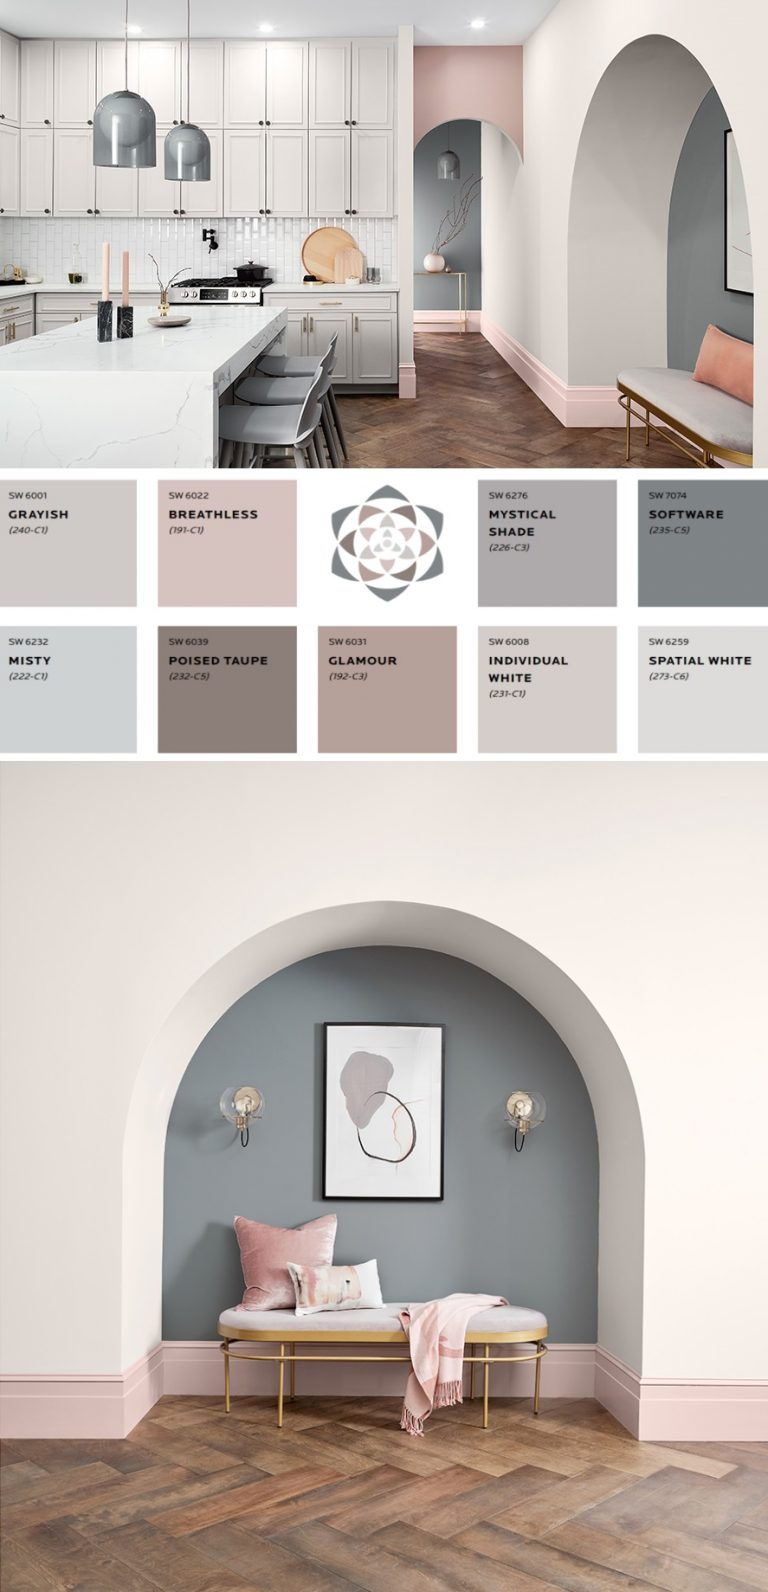 Neutral Paint Colors 2020 Interiors By Color In 2020 Neutral Paint Colors Trending Paint Colors Sherwin Williams Paint Colors